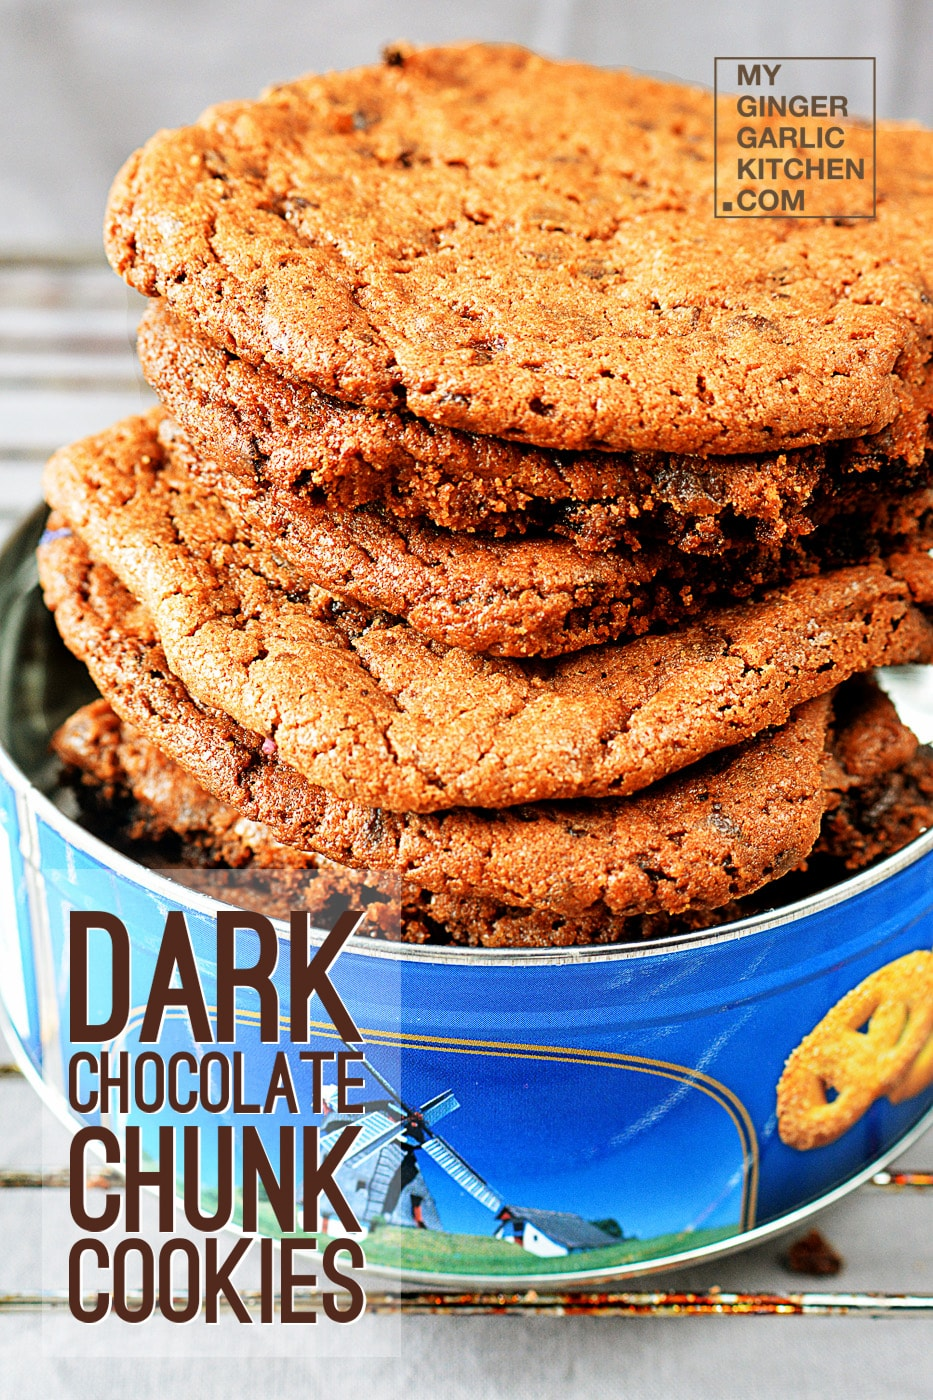 Image - recipe dark chocolate chunk cookies anupama paliwal my ginger garlic kitchen 41